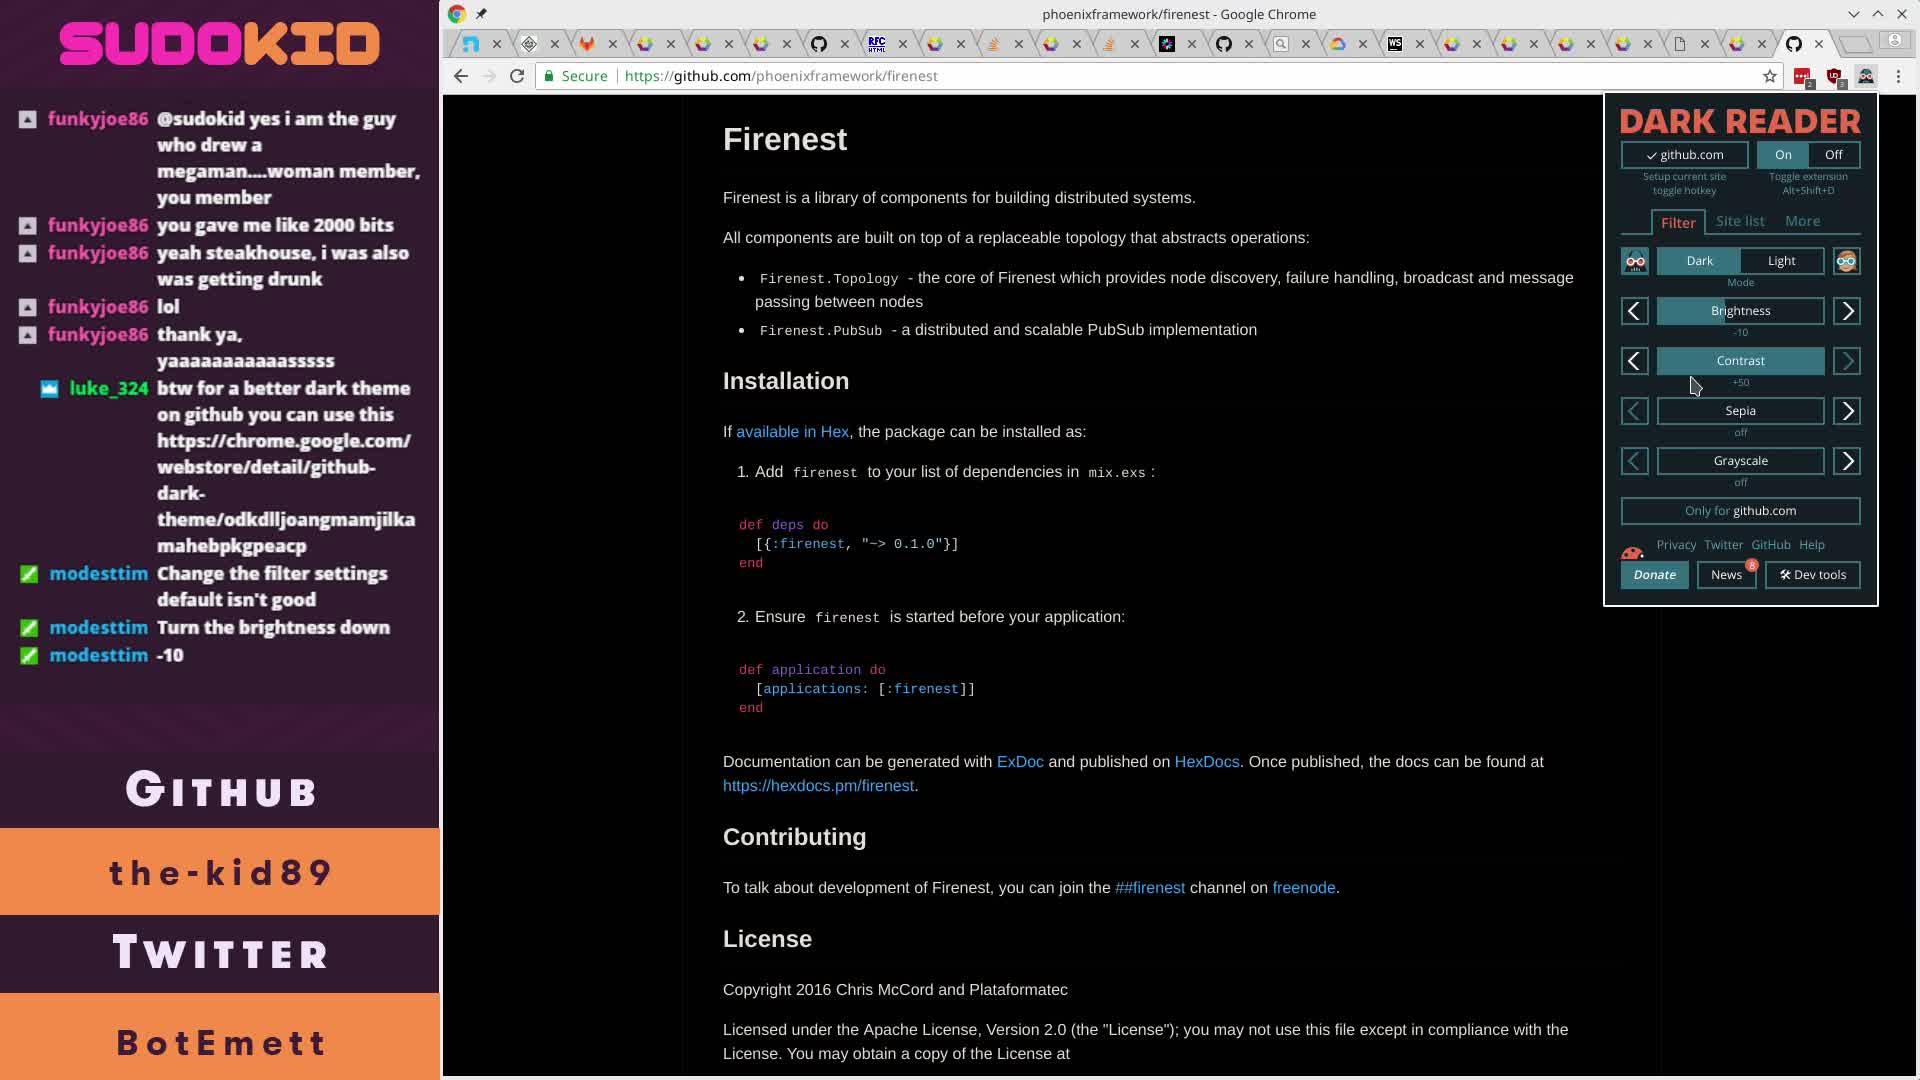 SudoKid - Hammering out some Elixir WebSocket stuff for Notify! - Twitch